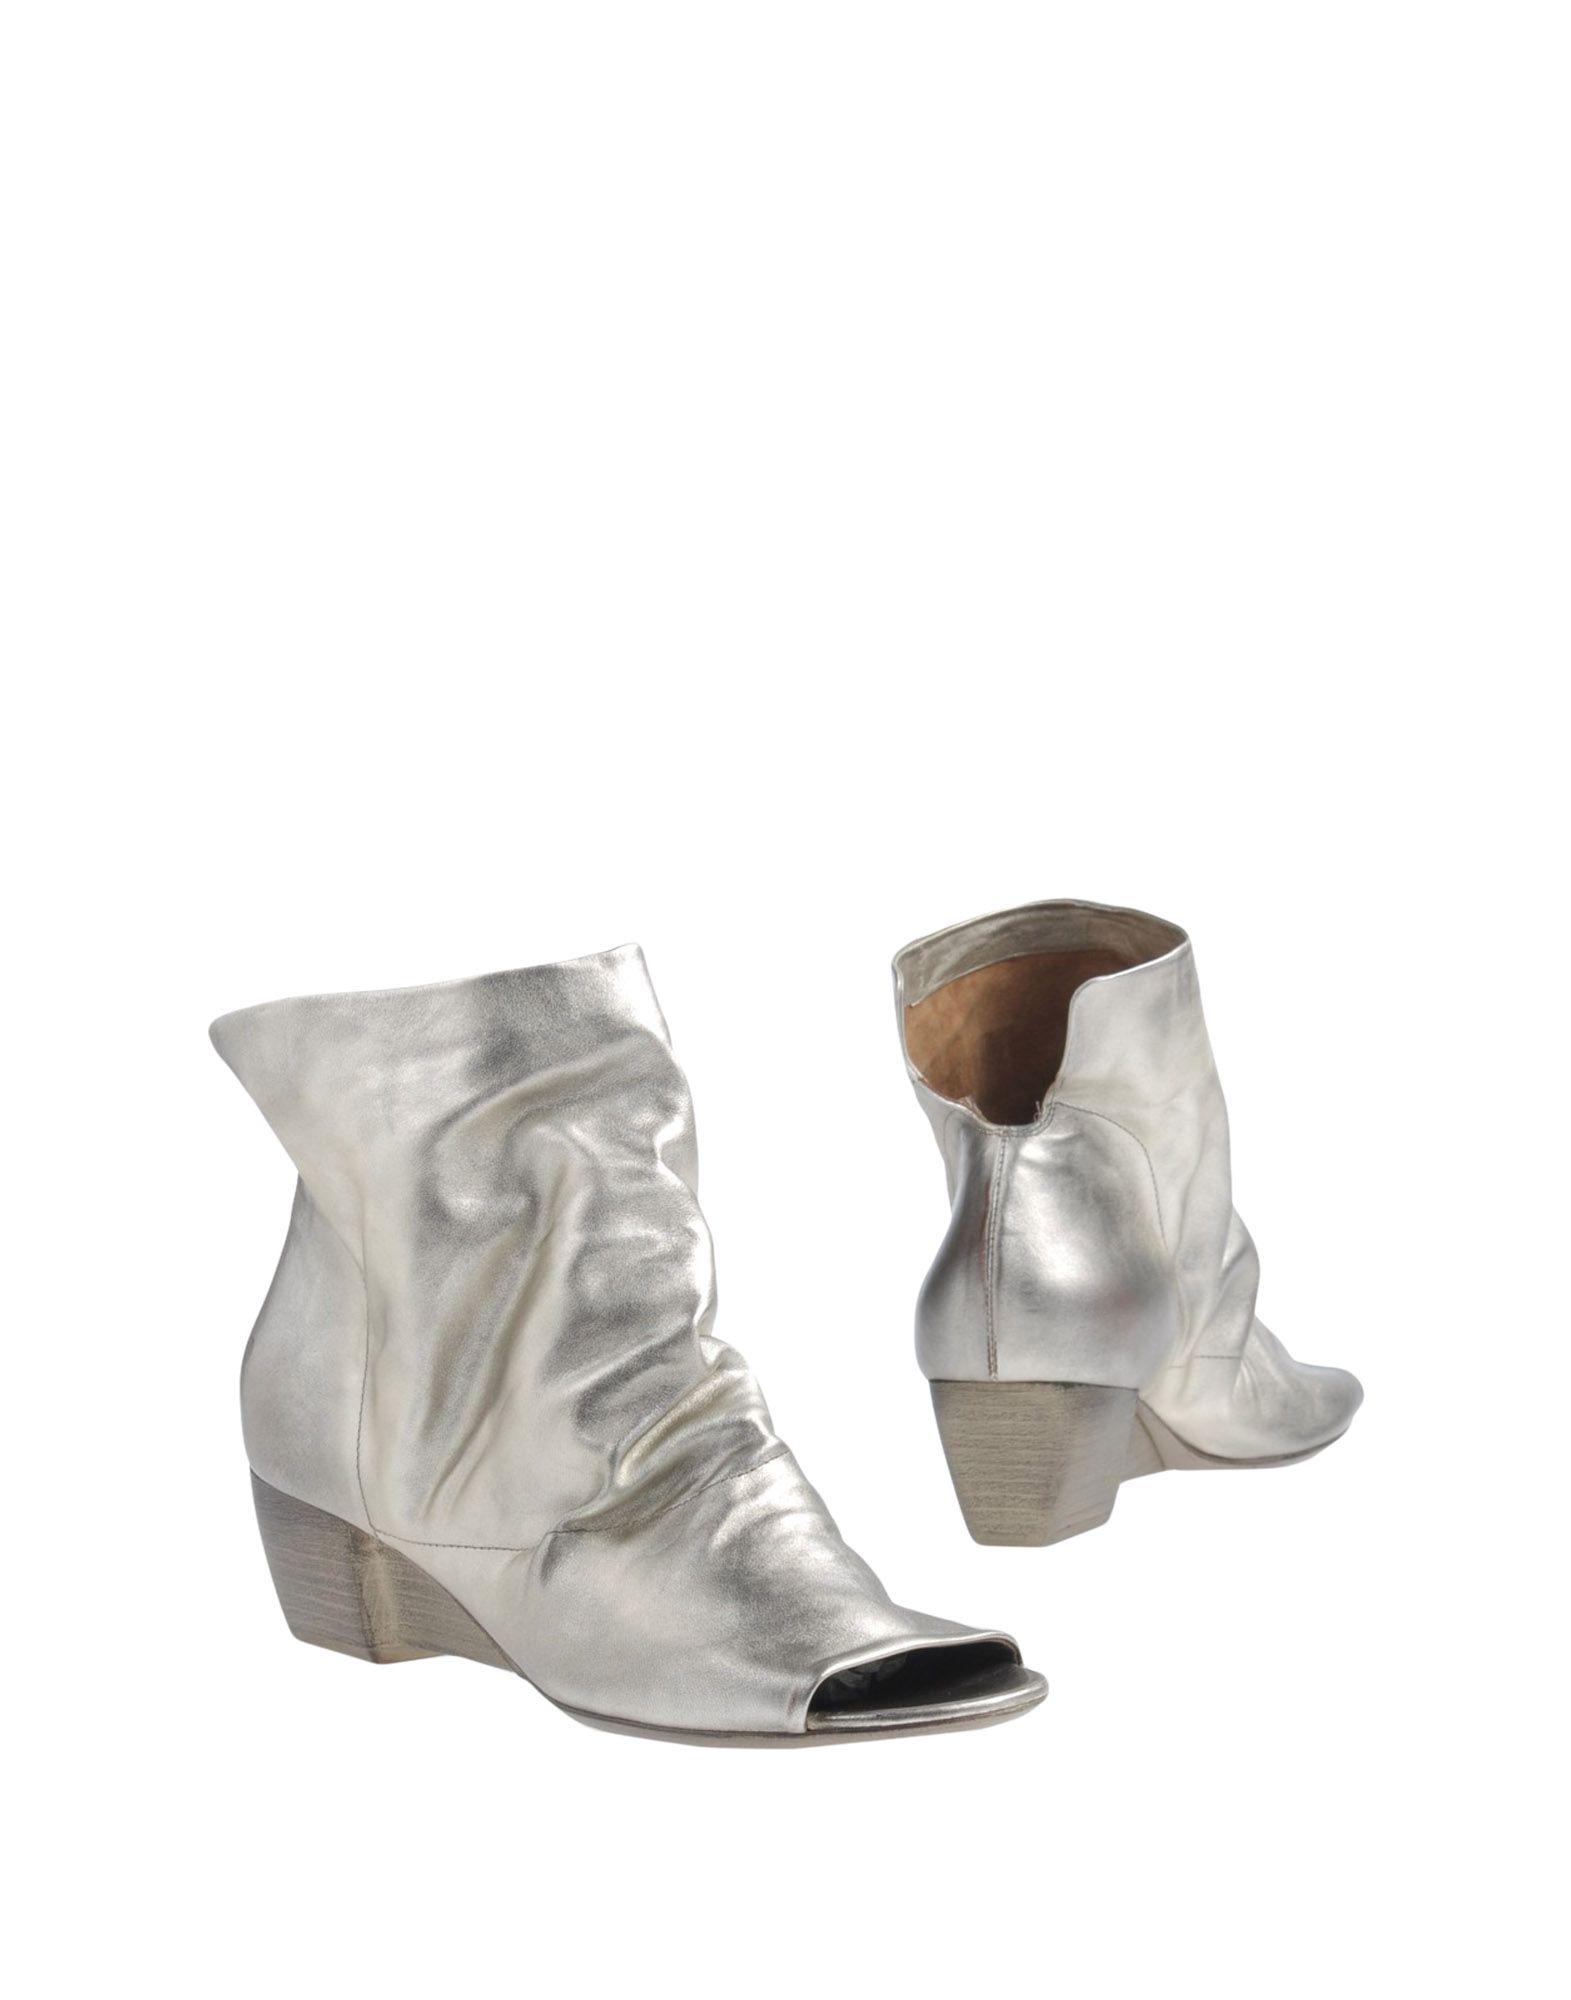 Haltbare Mode billige Schuhe Marsèll Stiefelette Damen  11388312BW 11388312BW 11388312BW Heiße Schuhe 9e5545